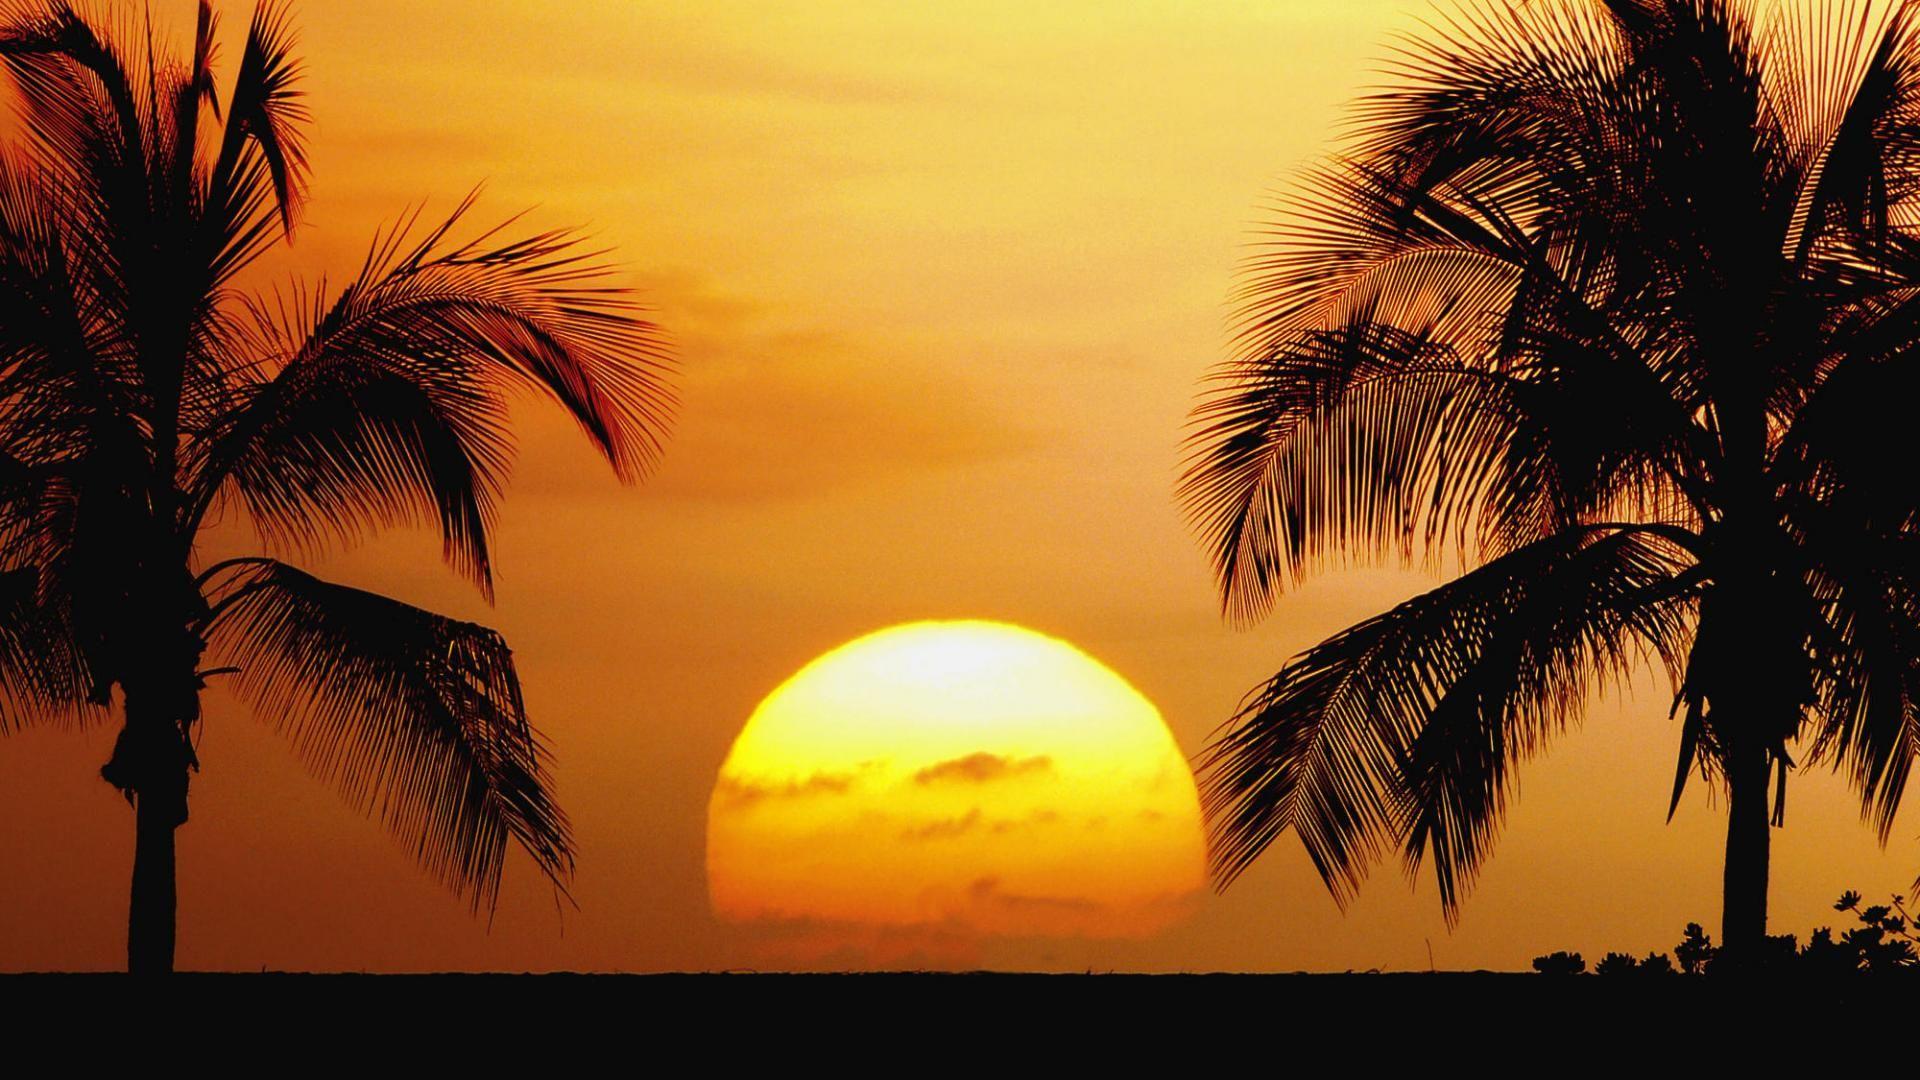 Palm Tree Sunset good background